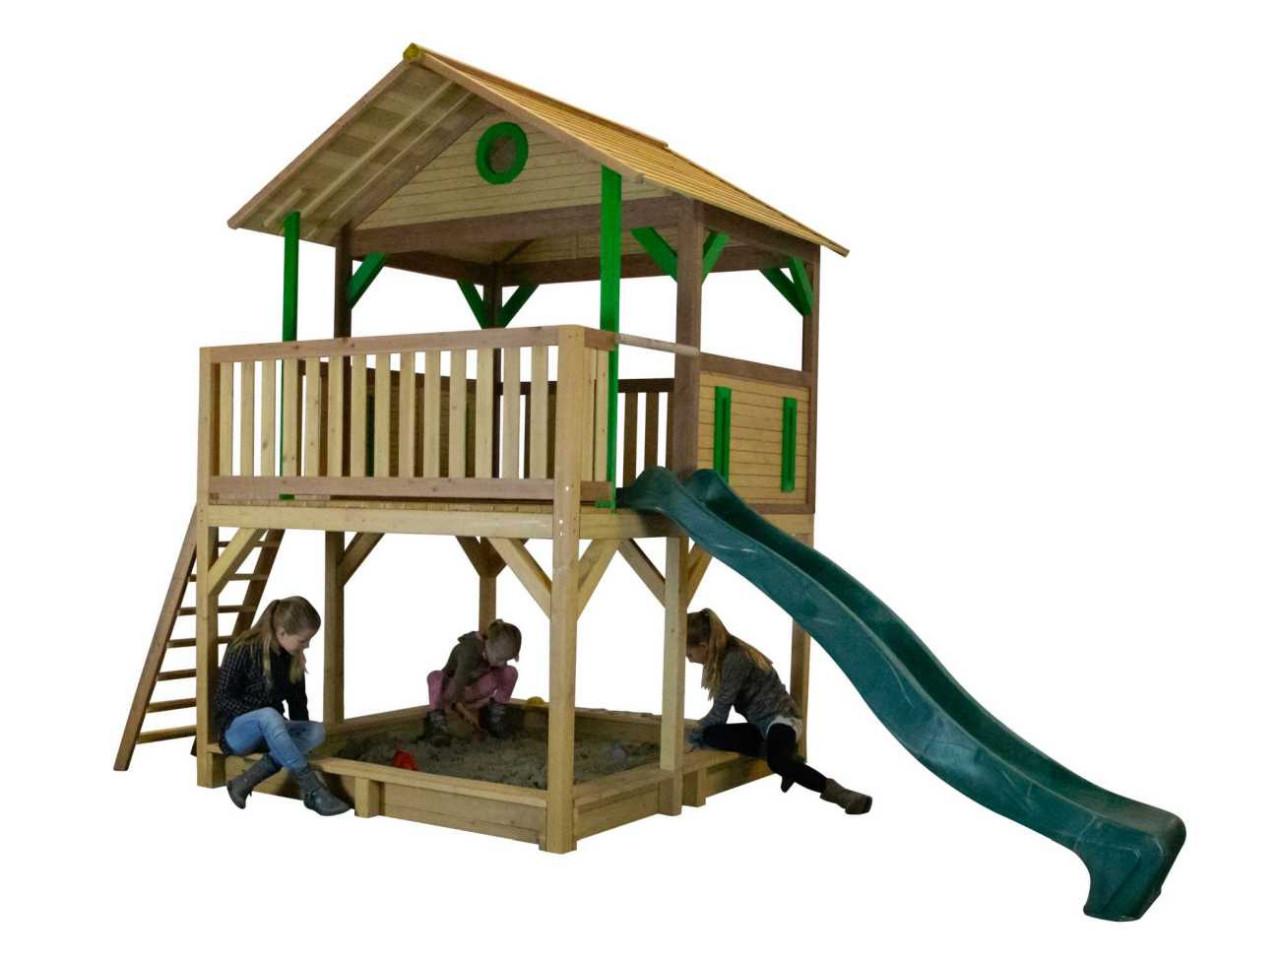 Full Size of Axi Spielturm Simba Mit Rutsche Holz Heider Garten Stapelstühle Trennwand Rattanmöbel Eckbank Liege Whirlpool Aufblasbar Essgruppe Lounge Möbel Kandelaber Garten Kletterturm Garten